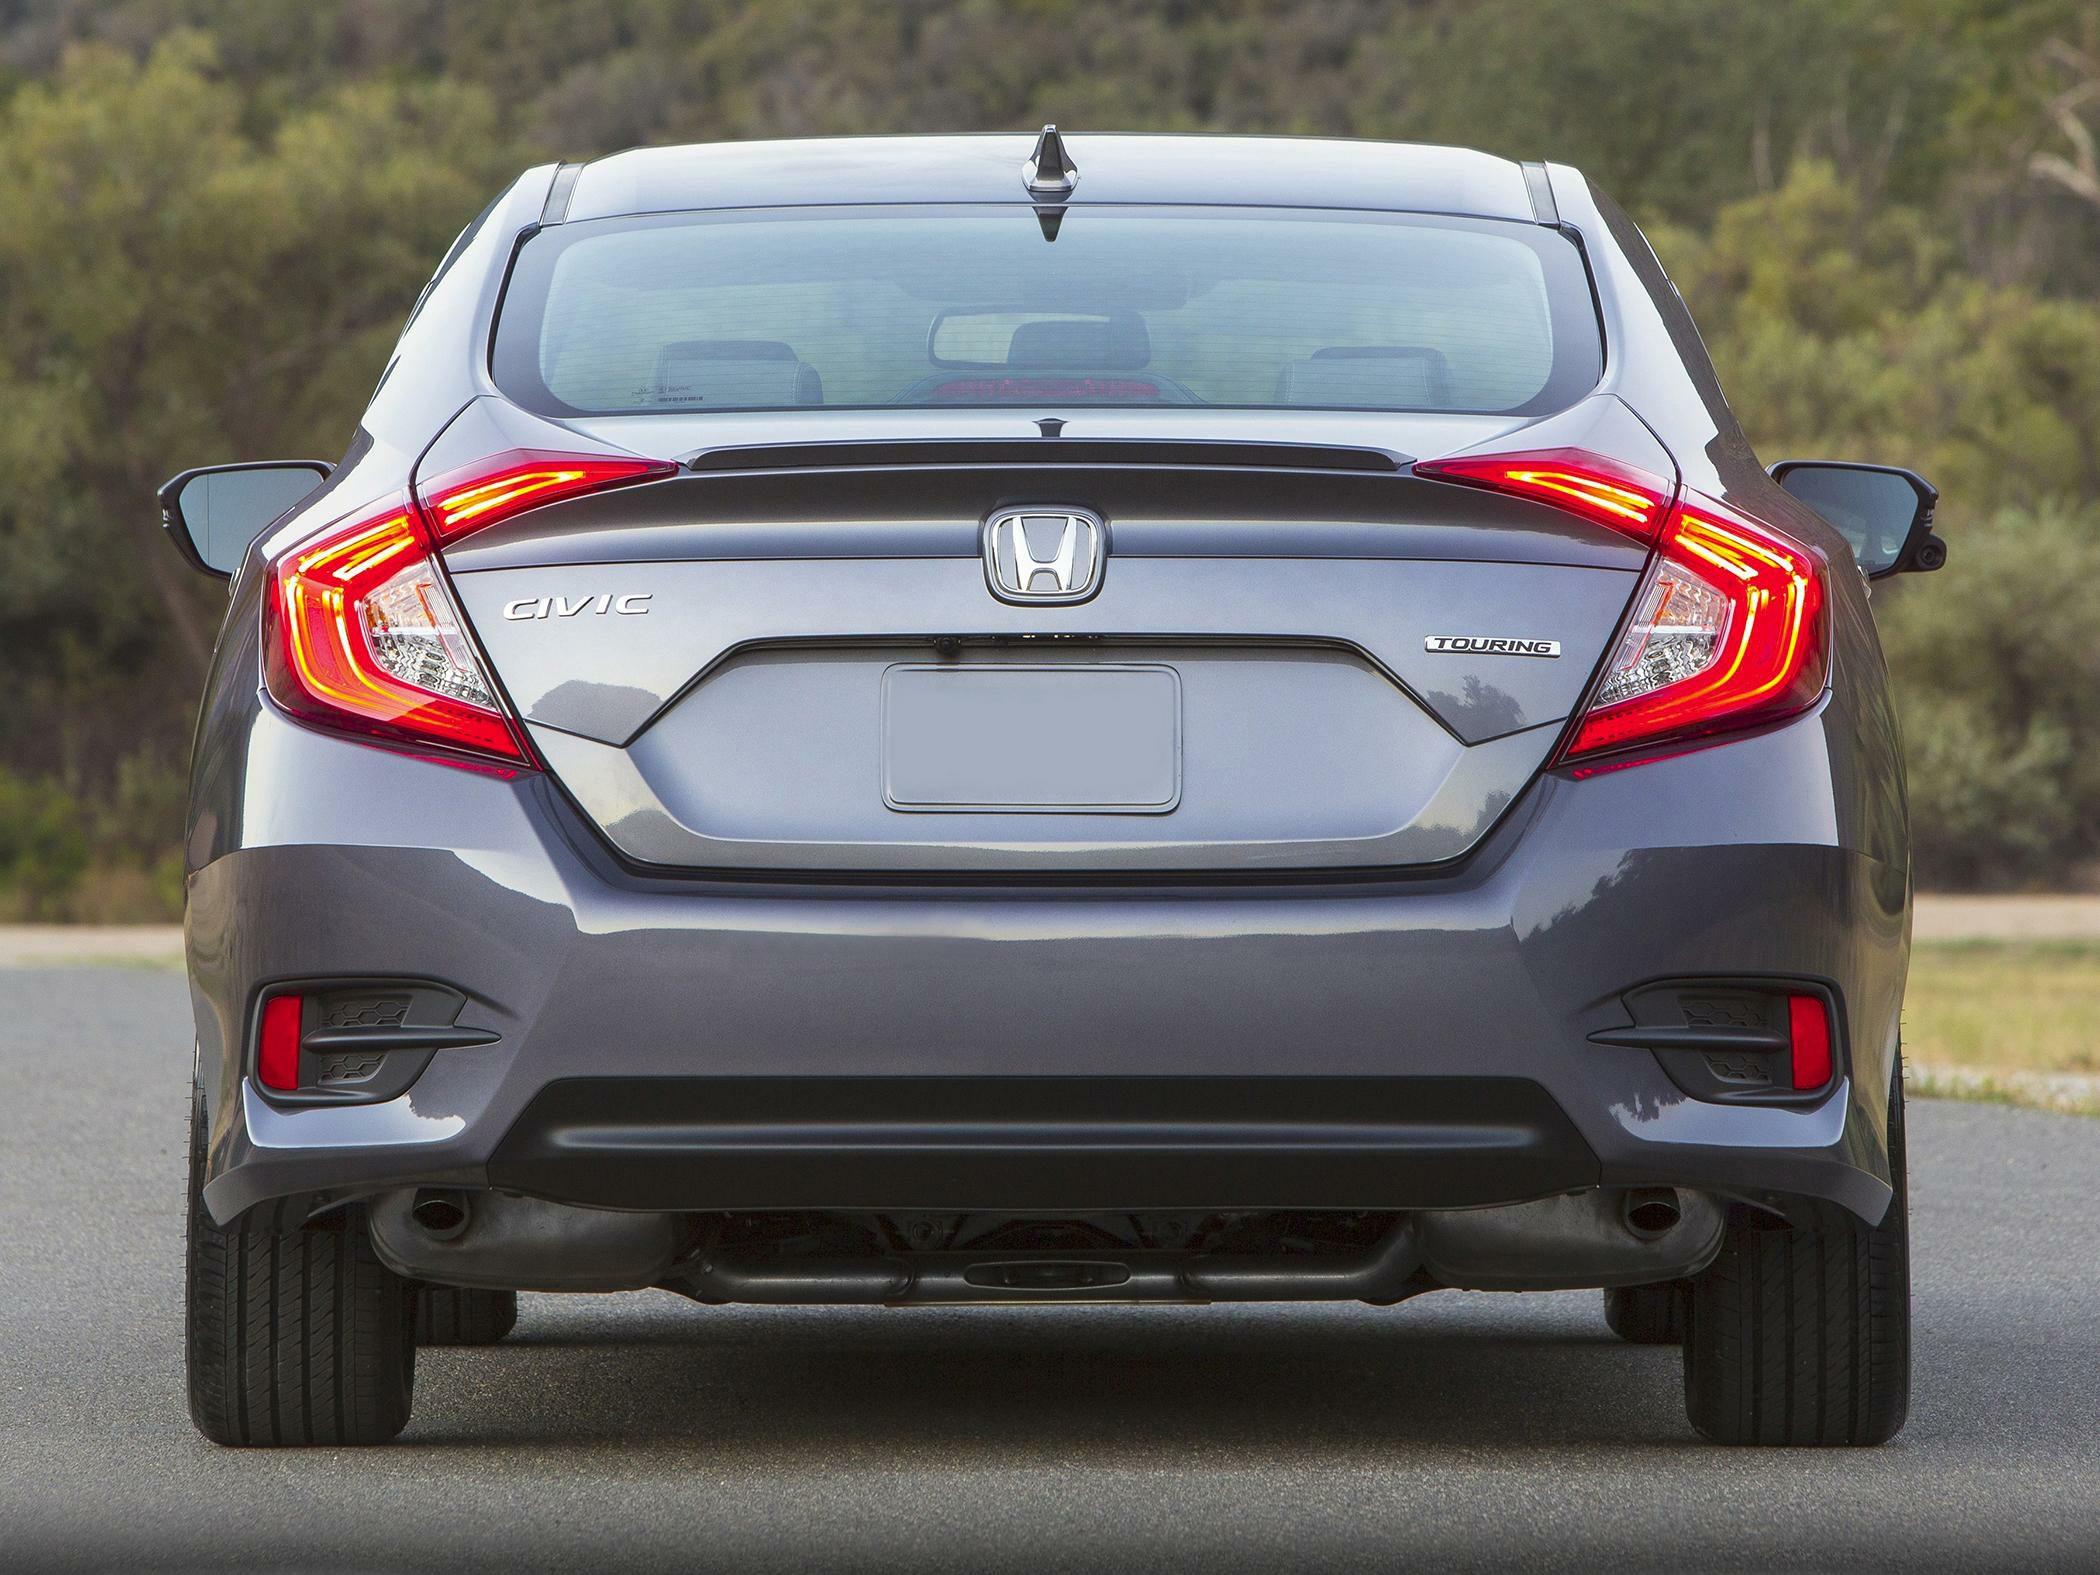 Honda Usa Cars >> Honda Civic New Car Price In Usa Buy Now